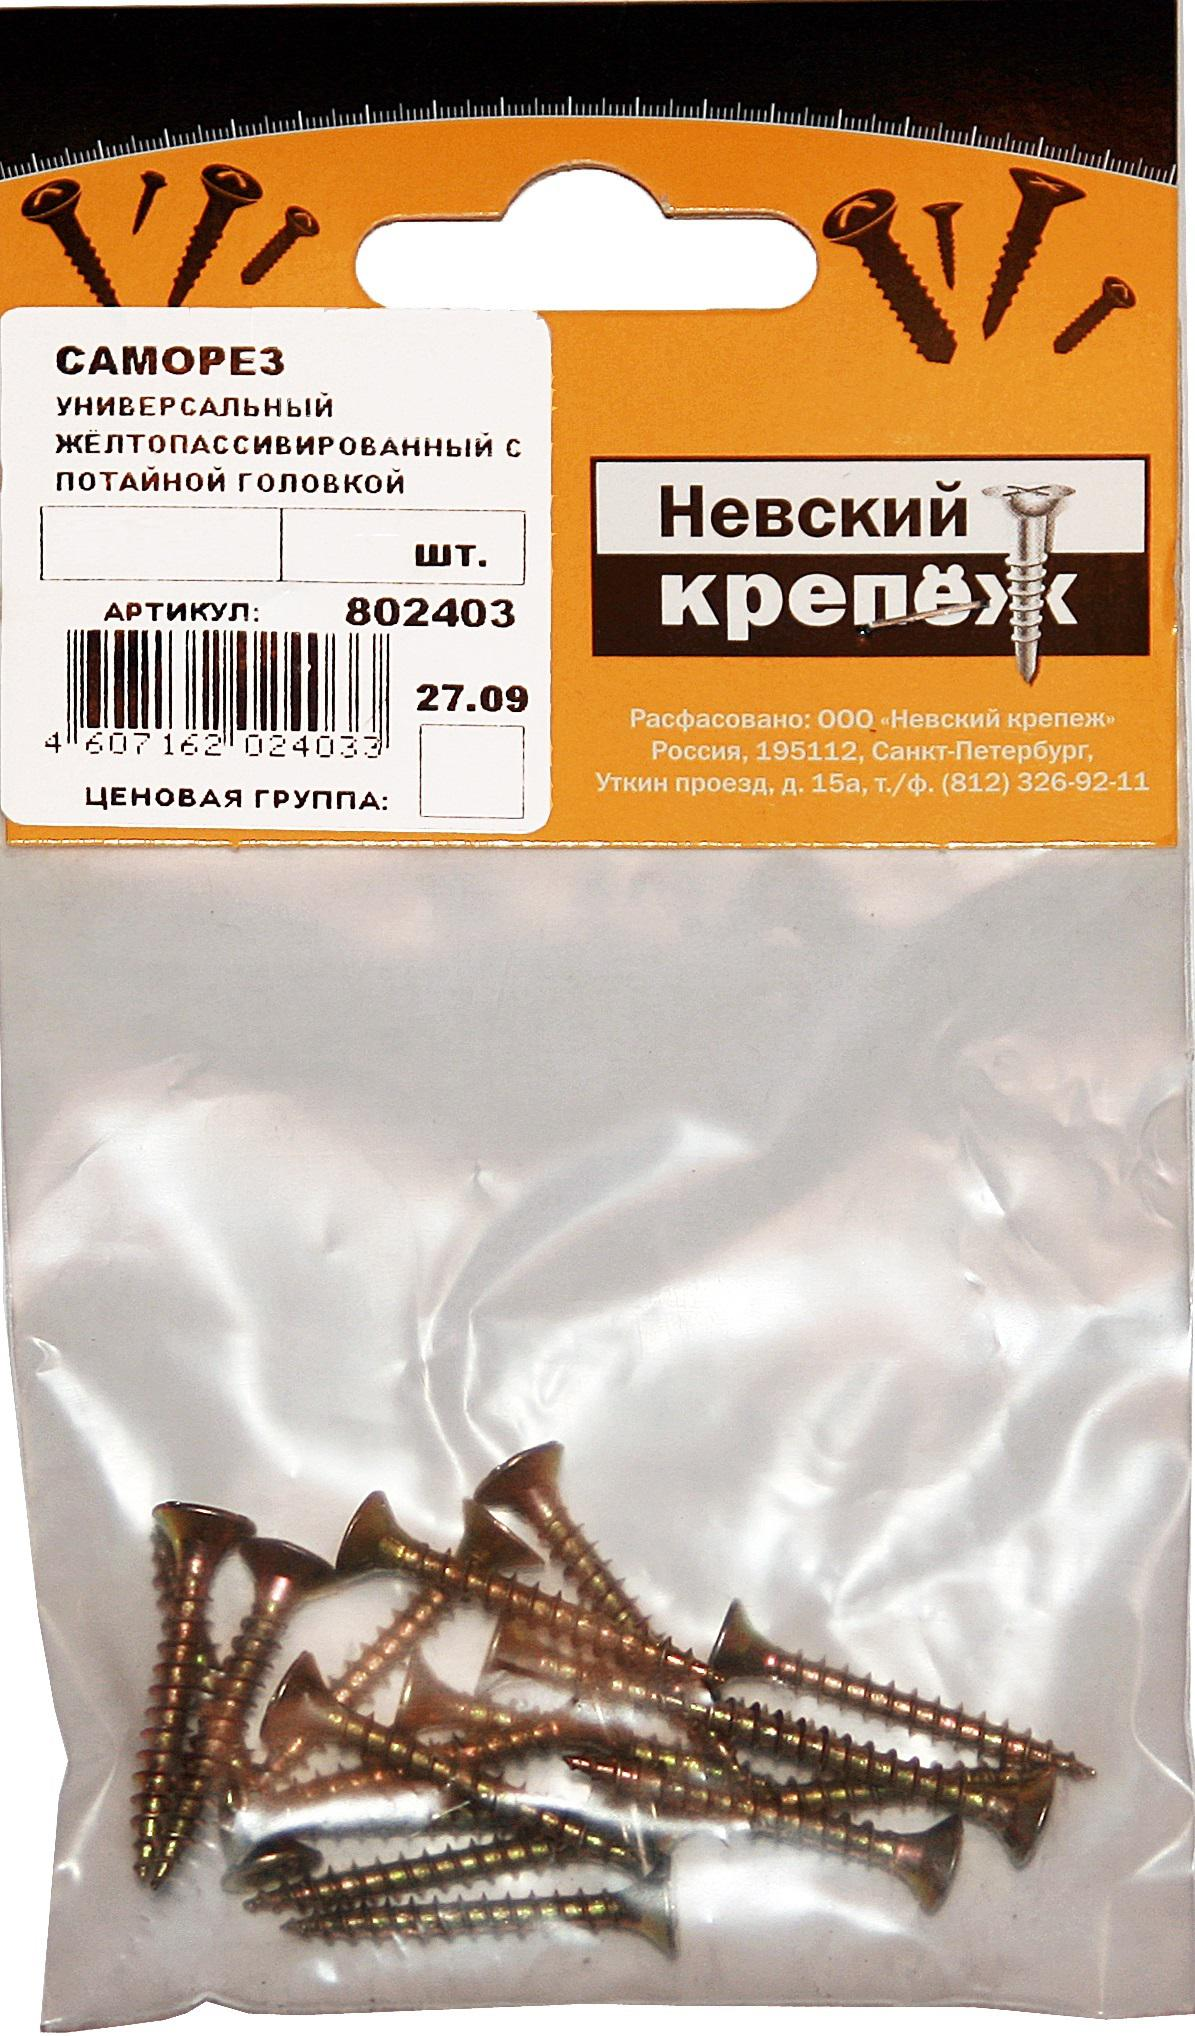 Саморез НЕВСКИЙ КРЕПЕЖ 802423